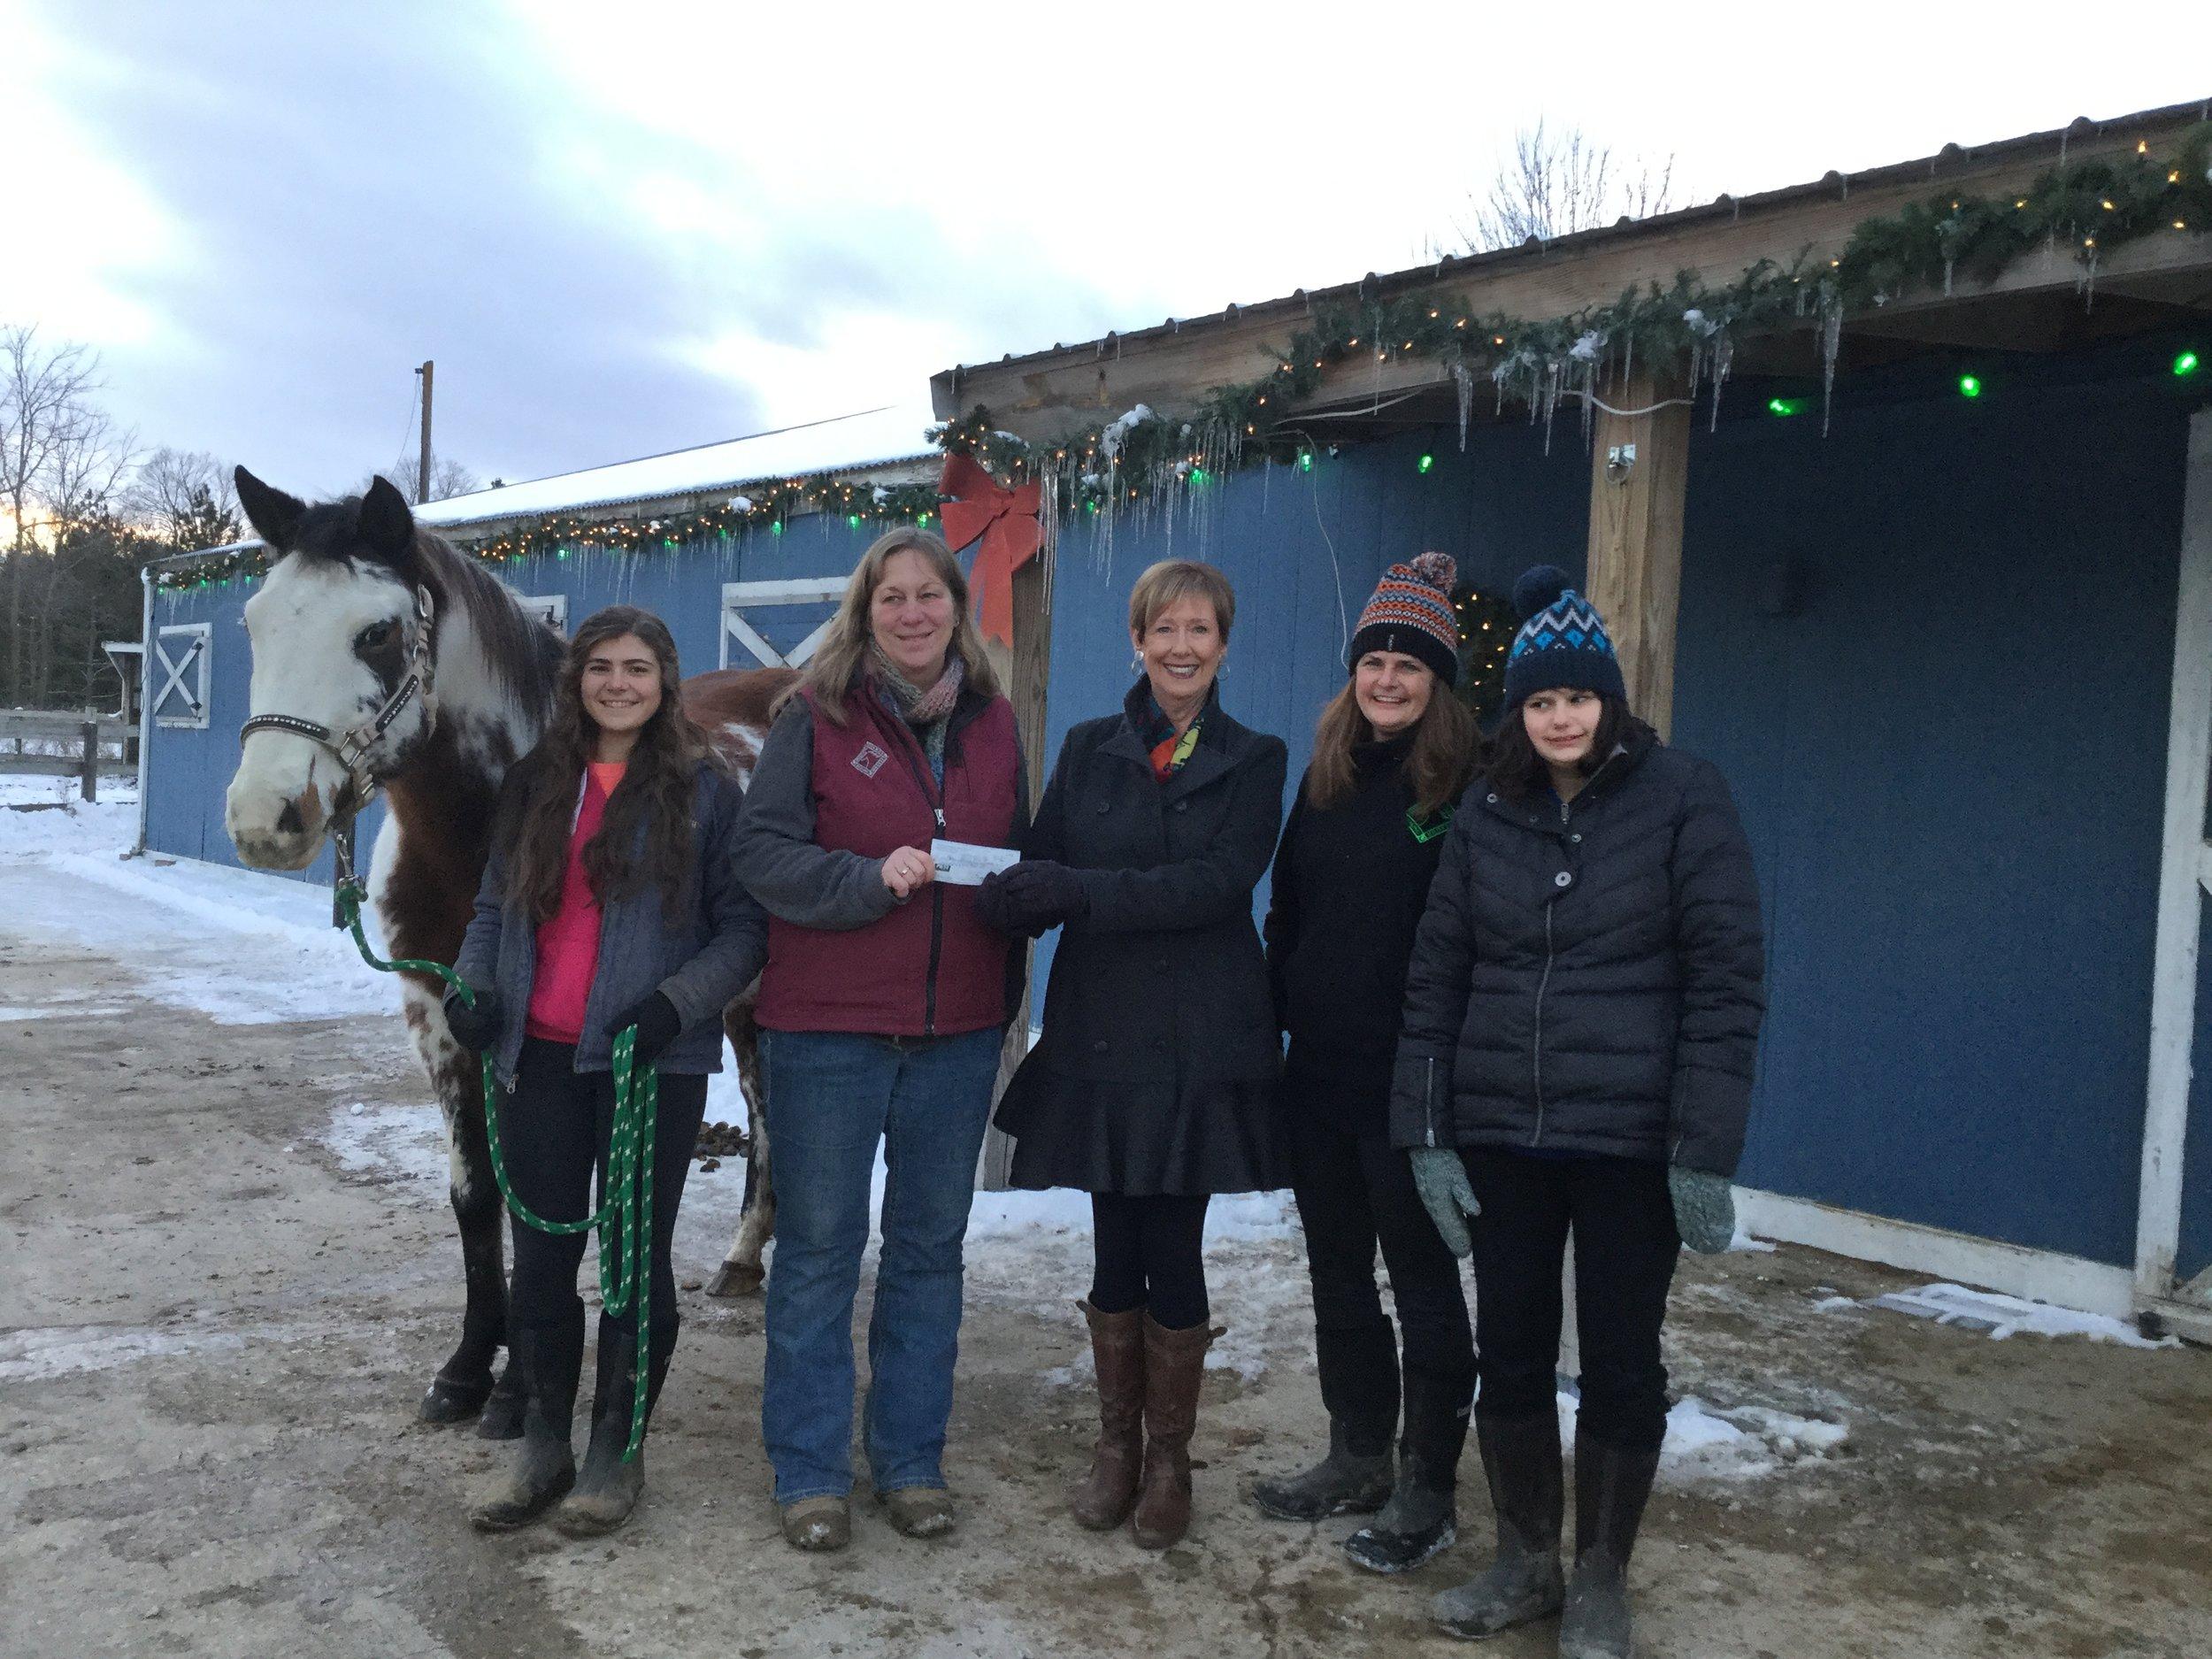 Helping Hands Healing Hooves December 15, 2017